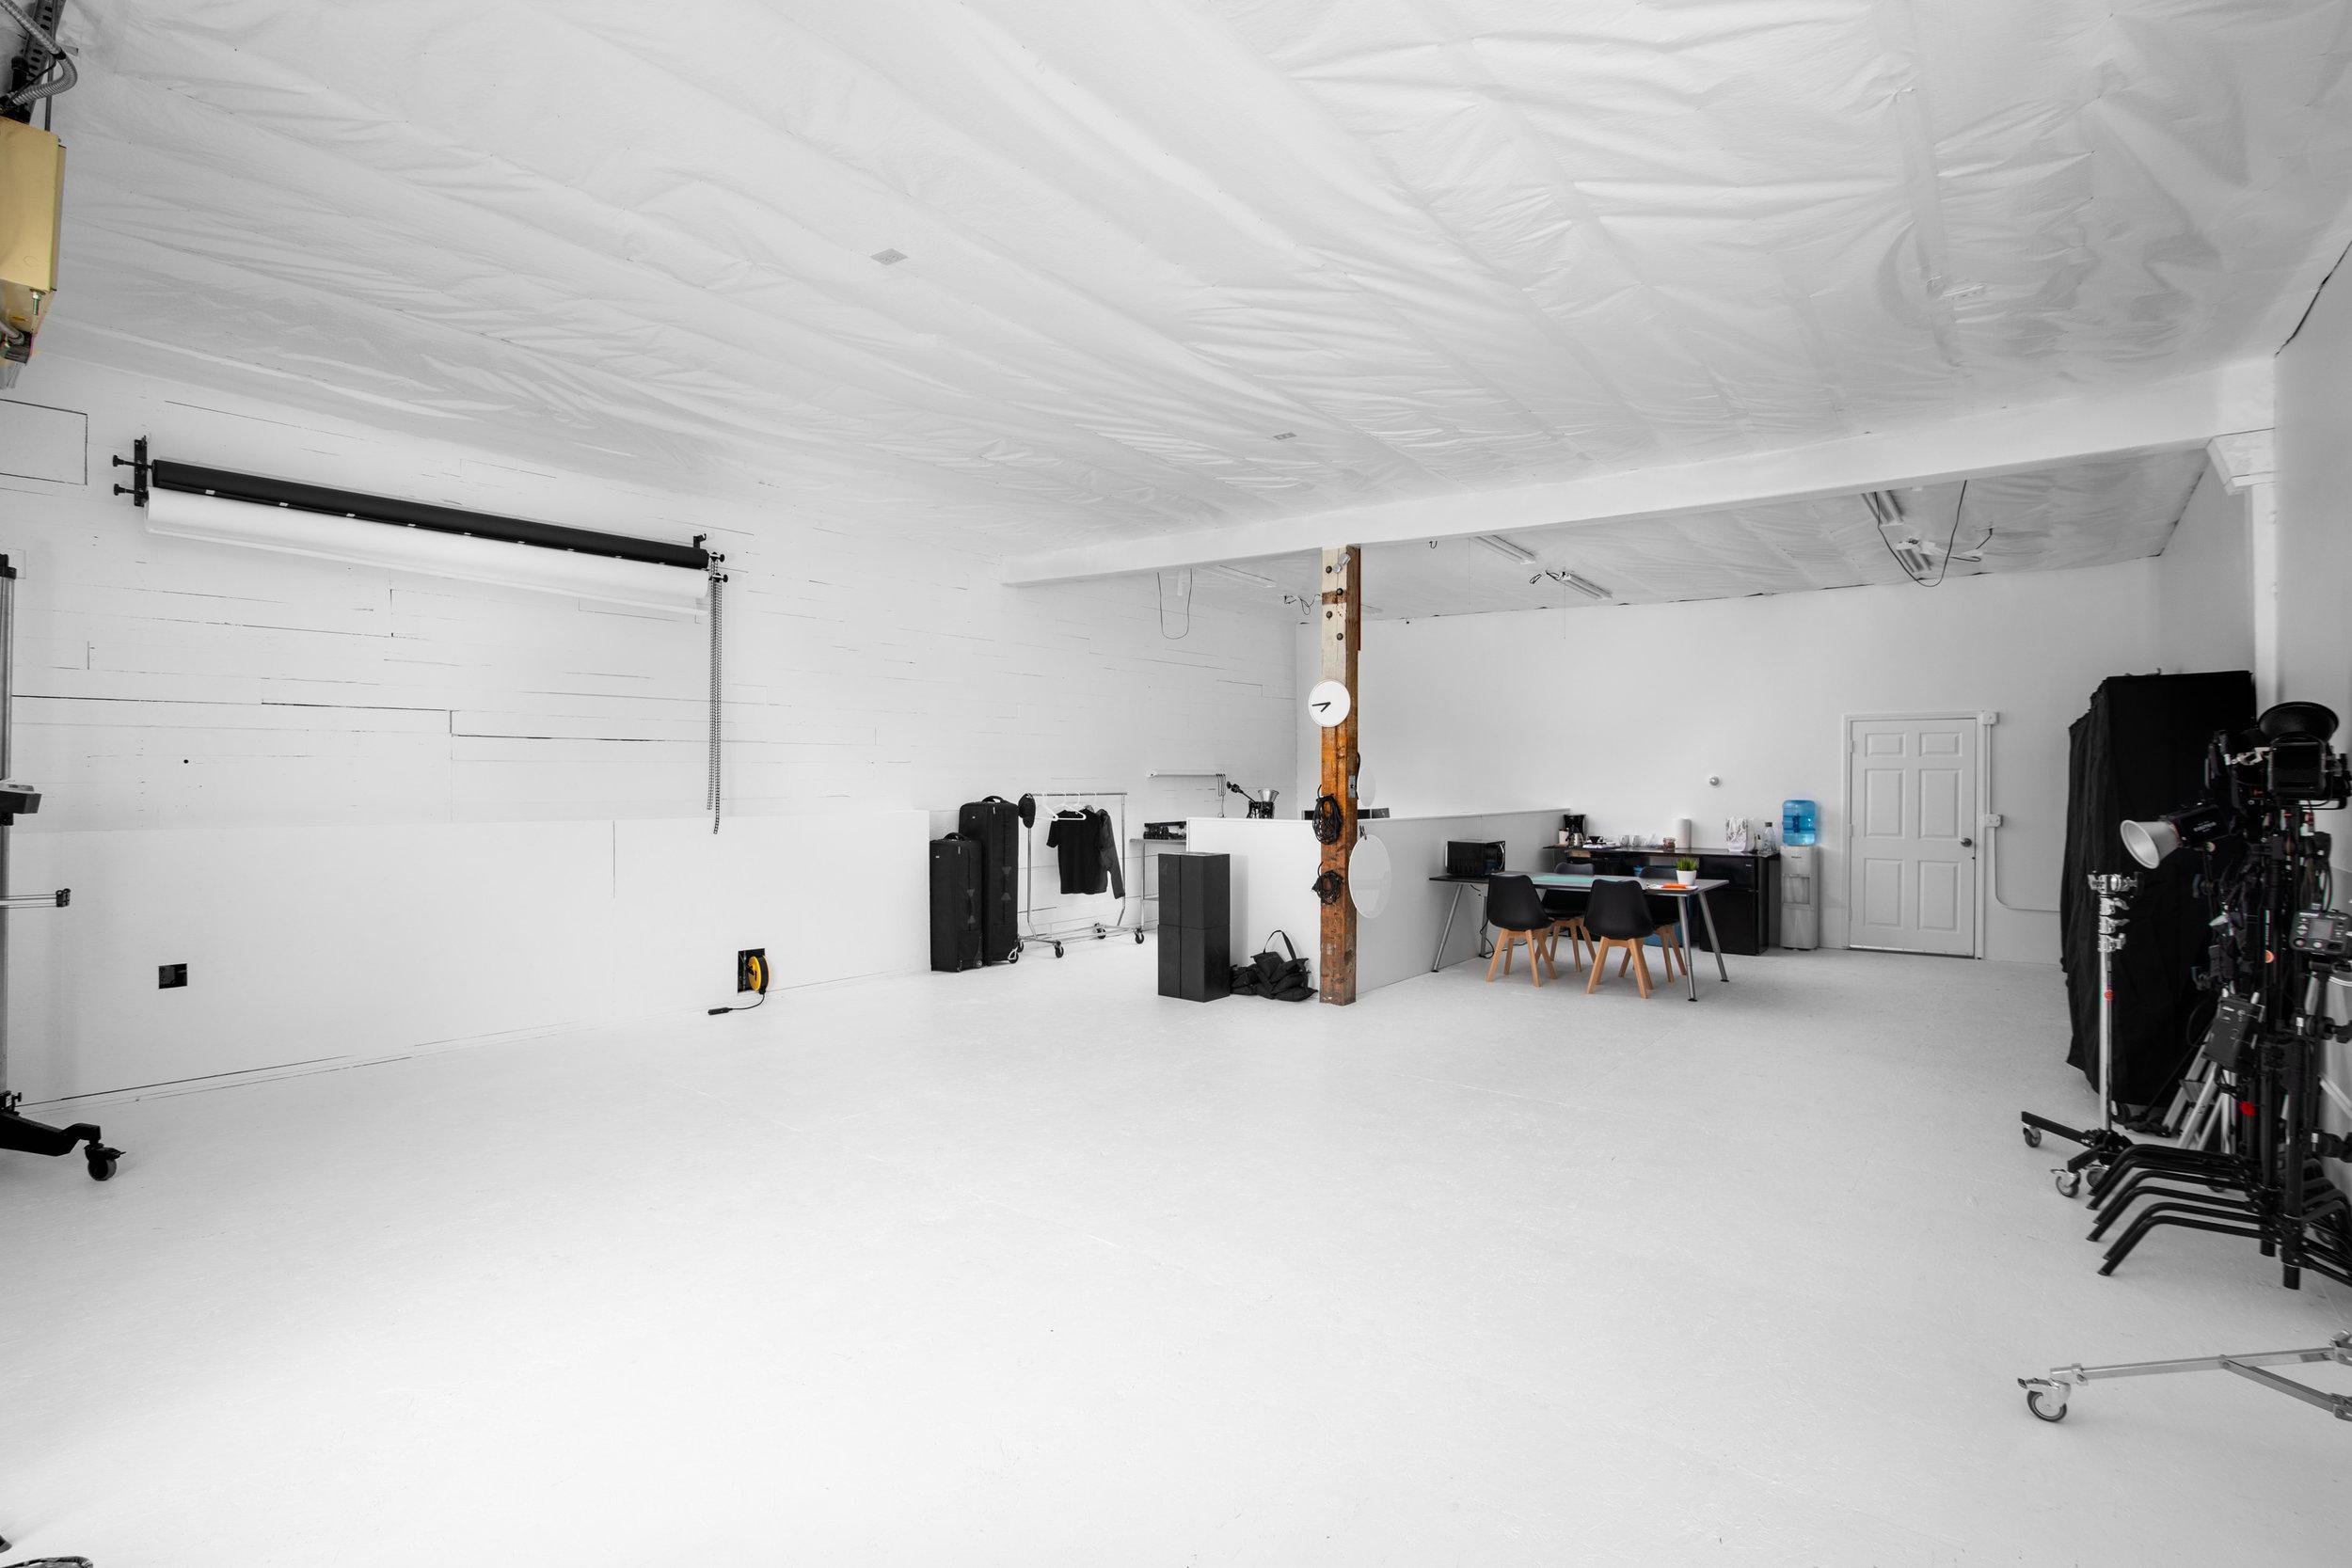 spencer wallace photo studio rental video-2.jpg